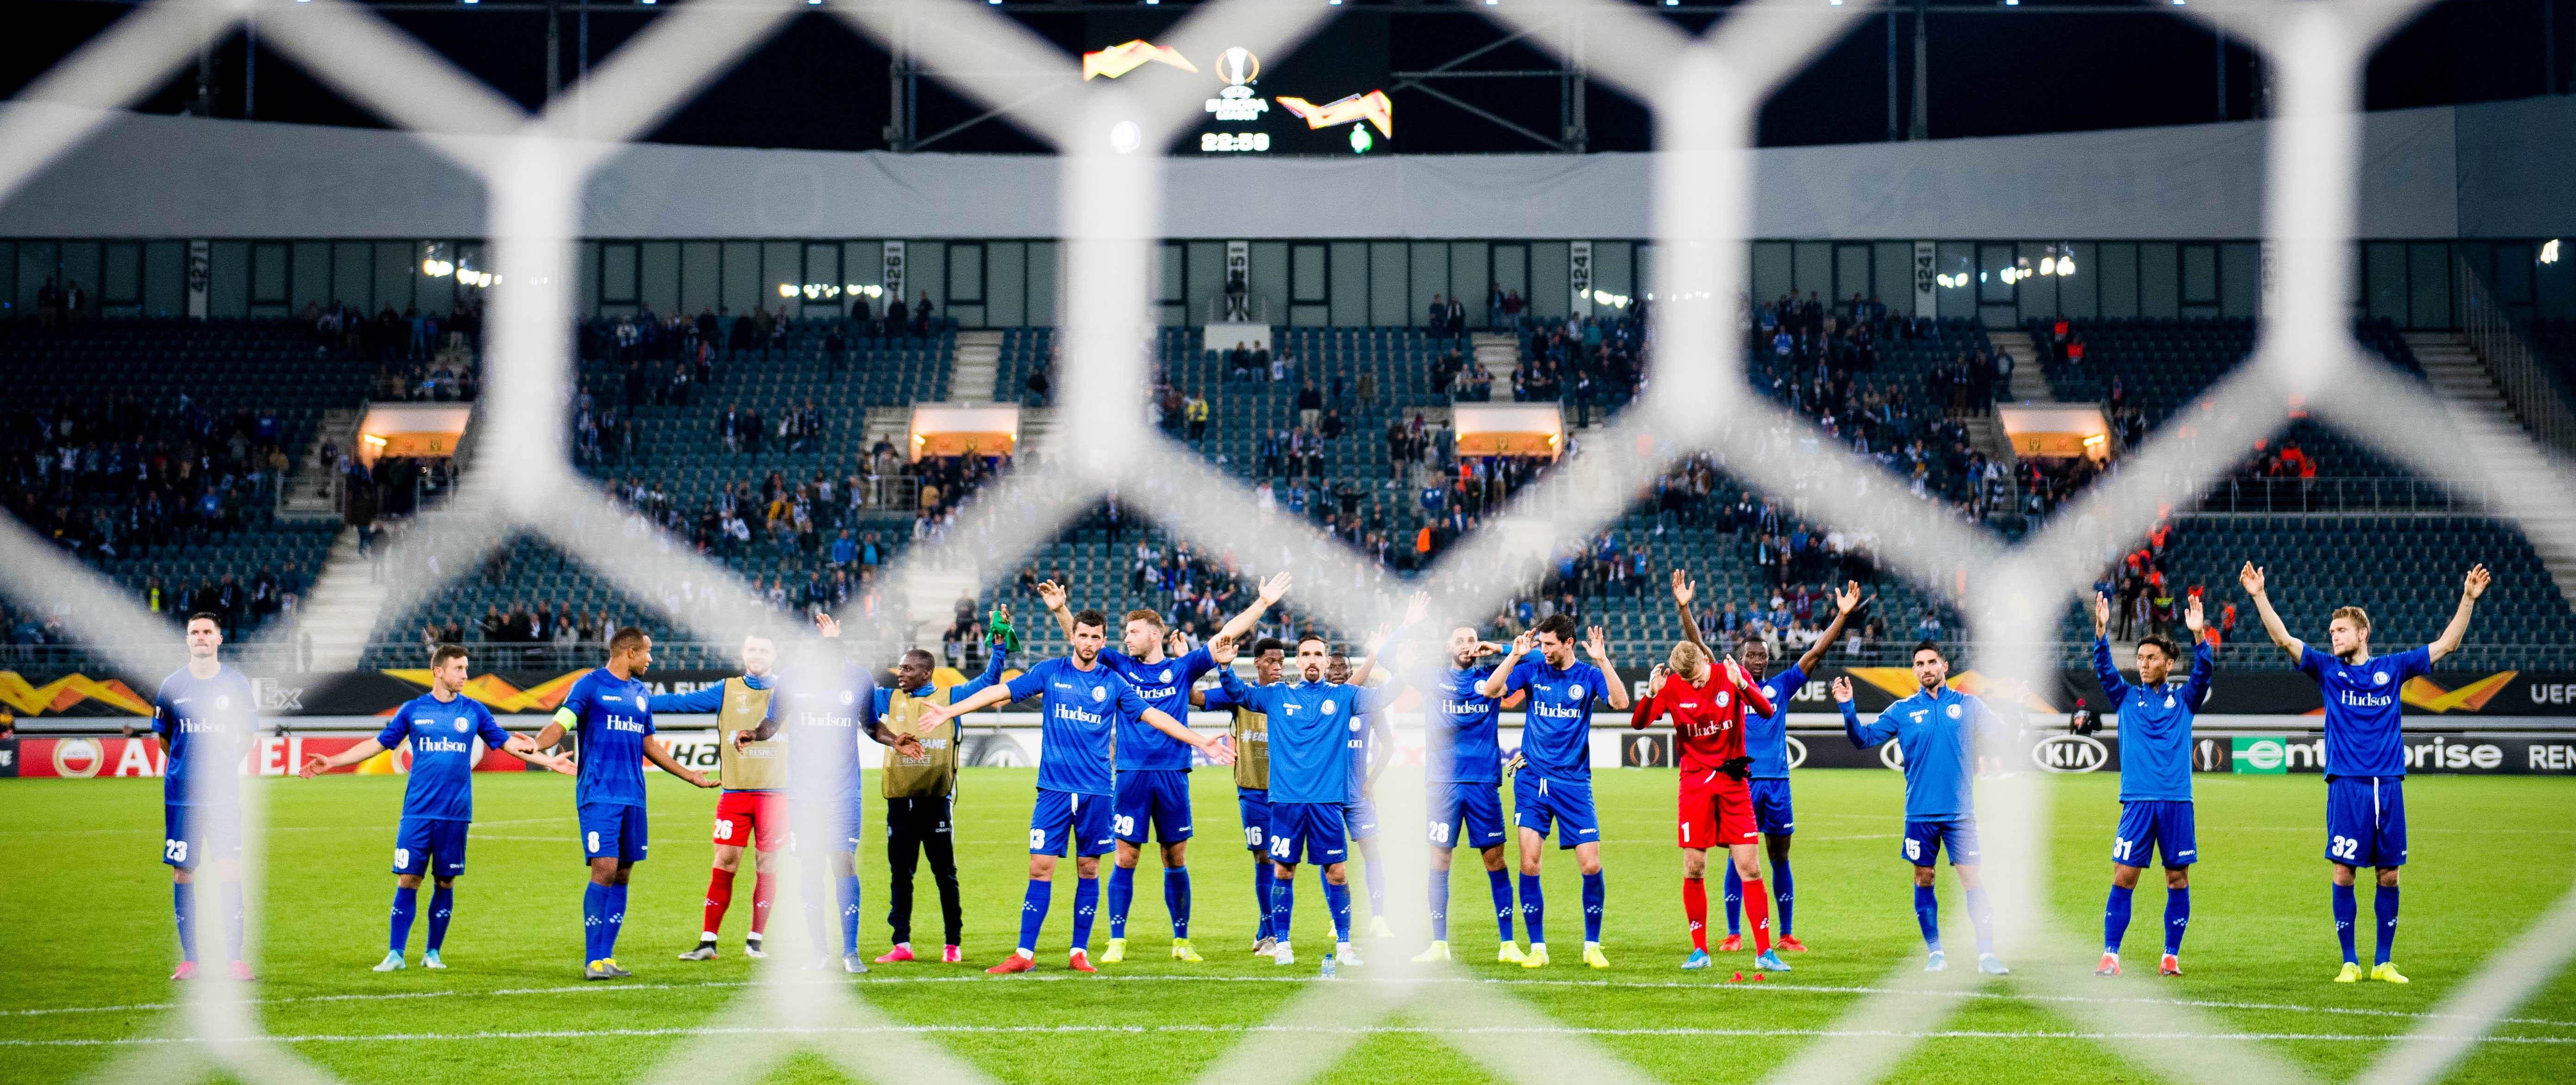 AA Gent - Europa League 19-20